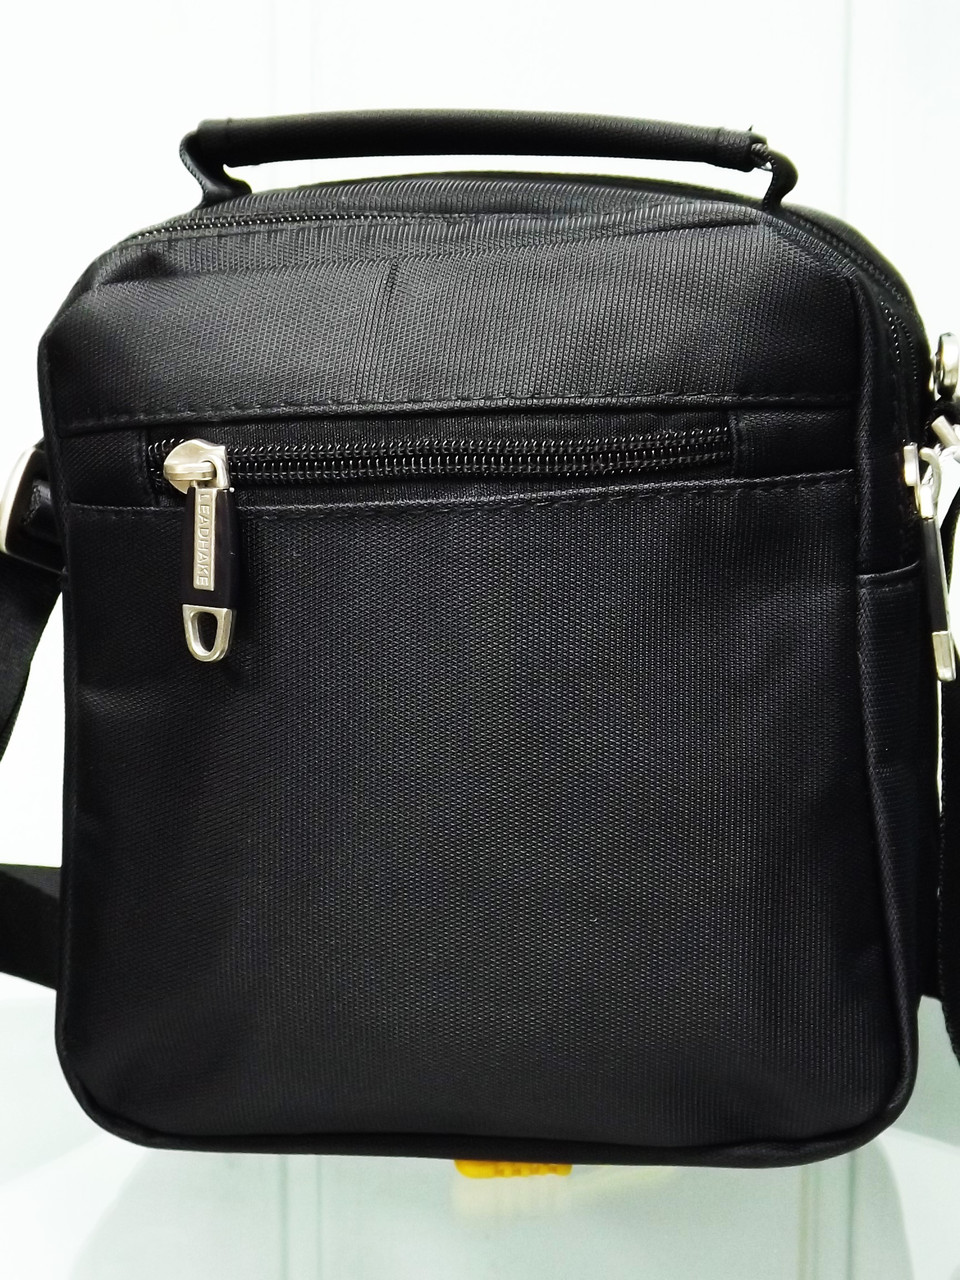 fc65158adf95 Мужская текстильная сумка через плечо Leadhake 550 черная: продажа ...